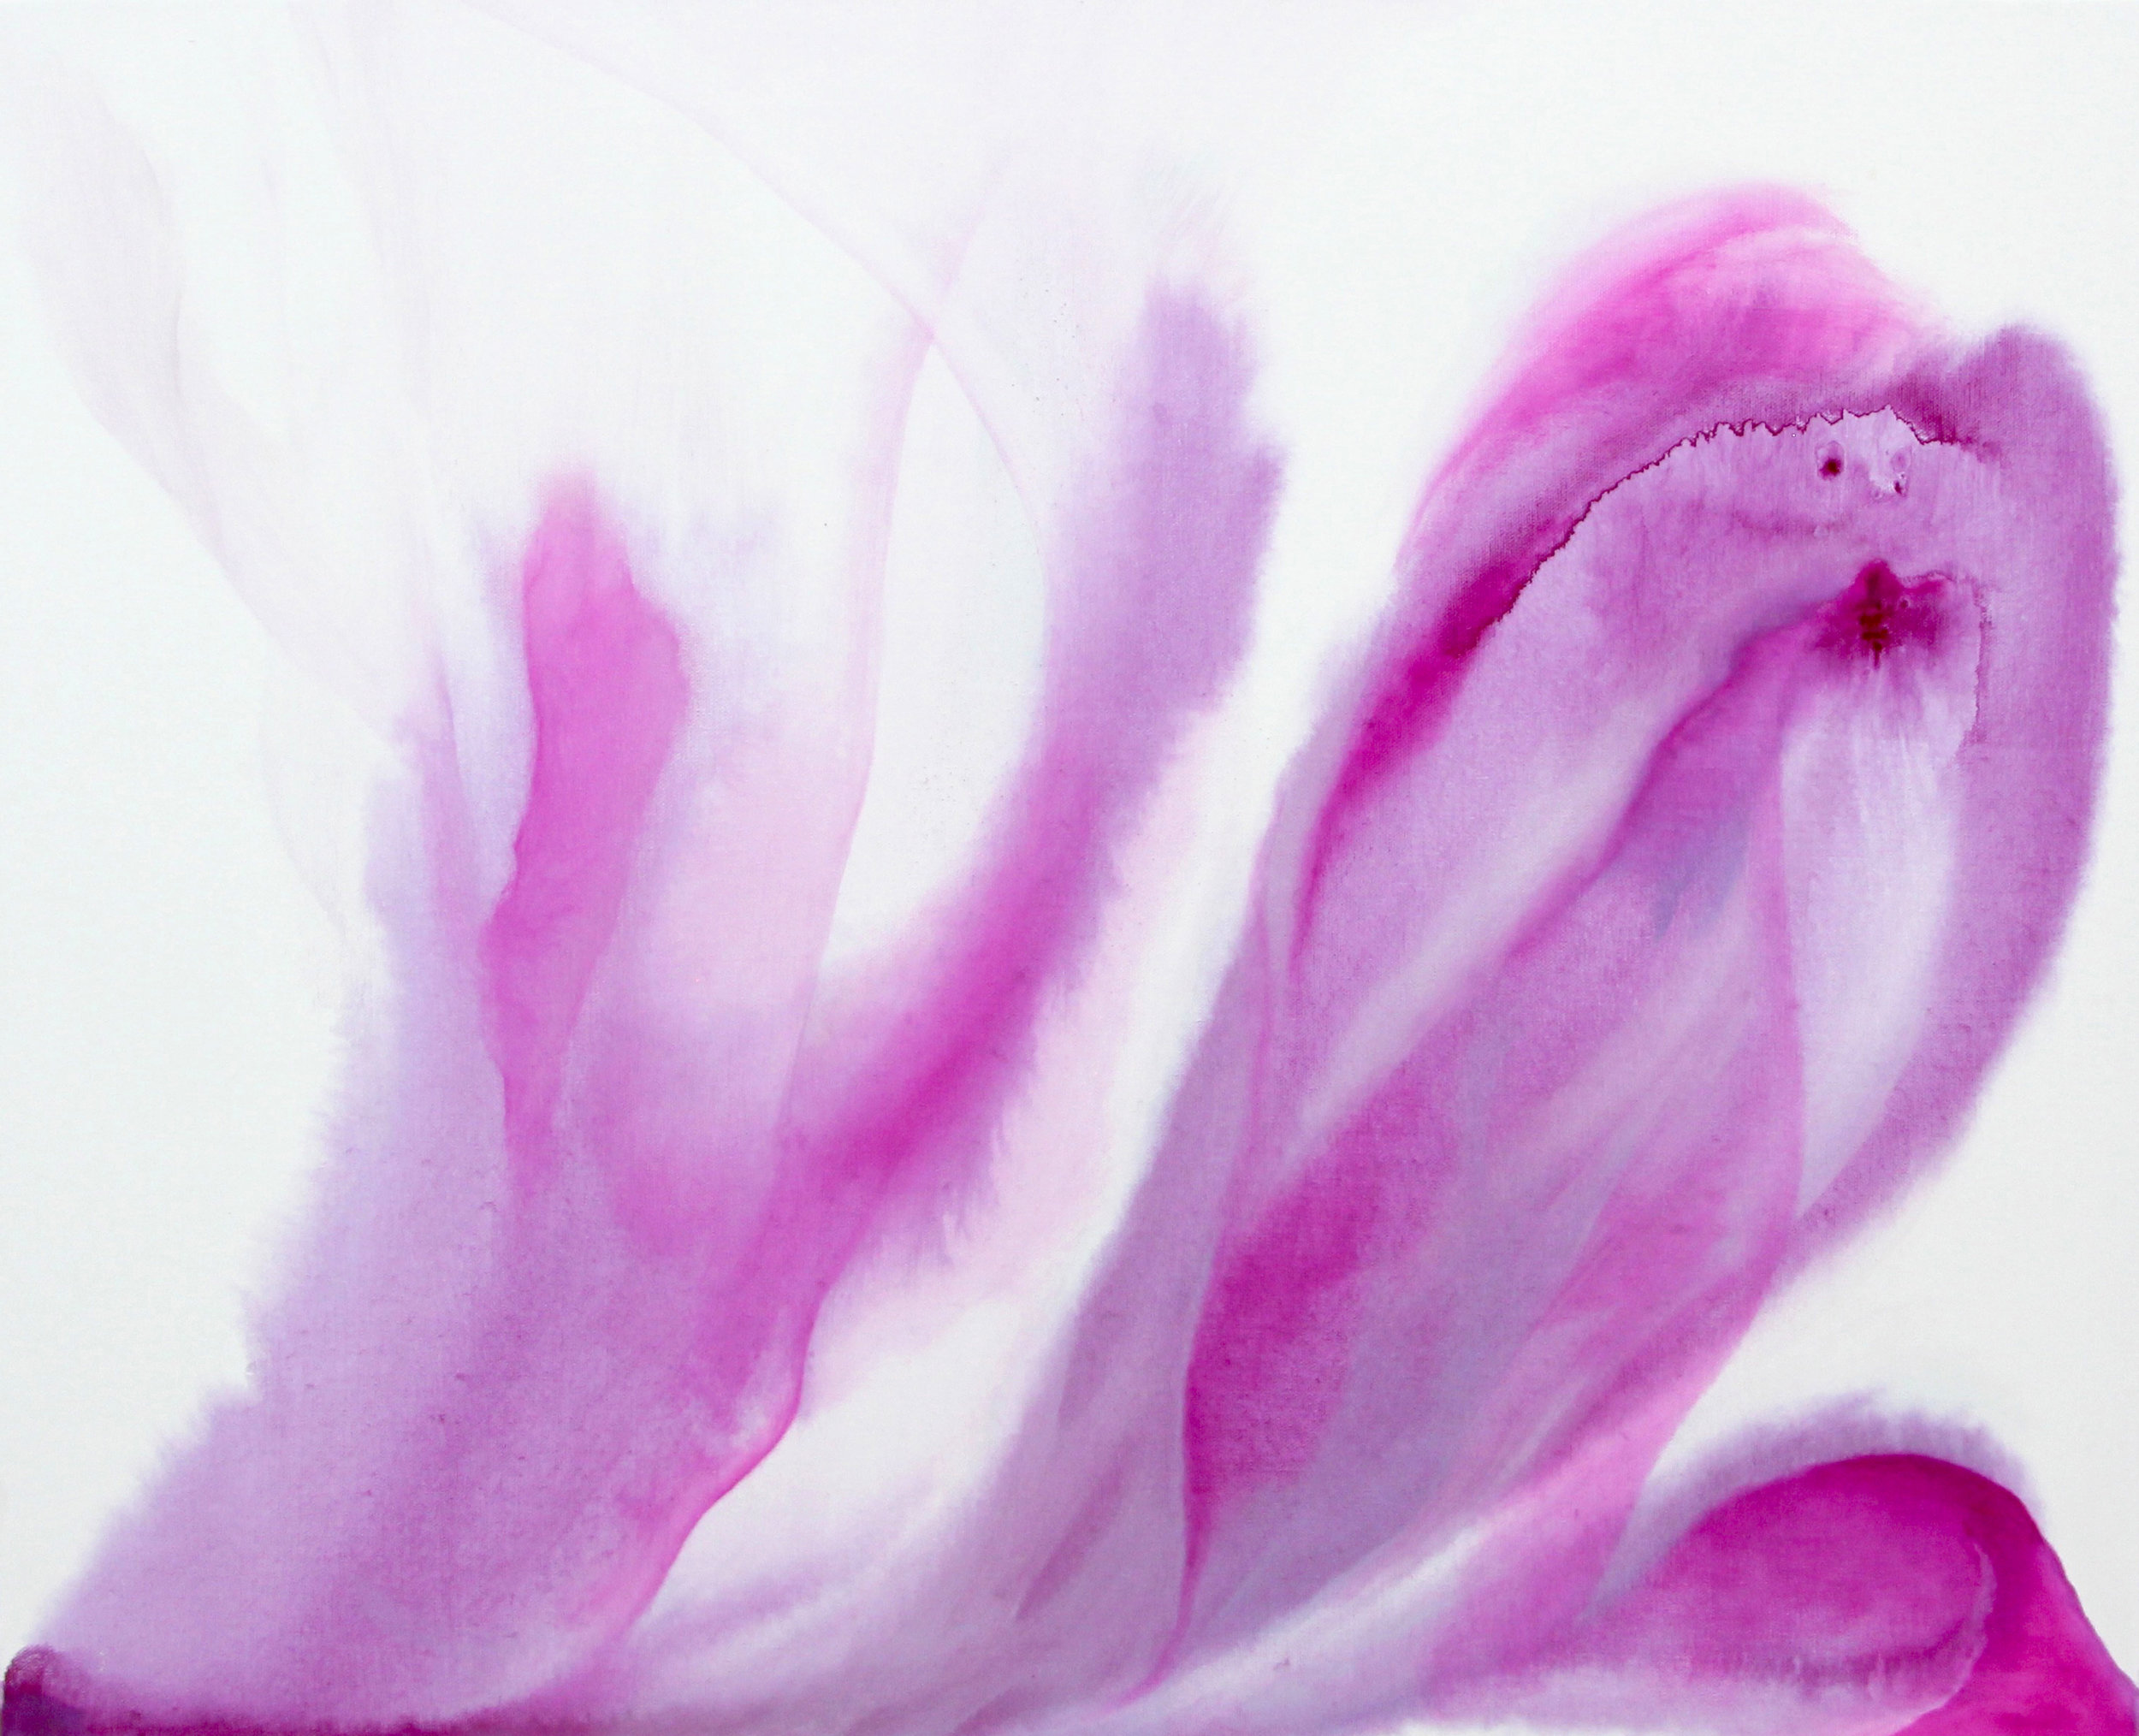 ephemeral_08  90 X 73 cm  oil on canvas  2017